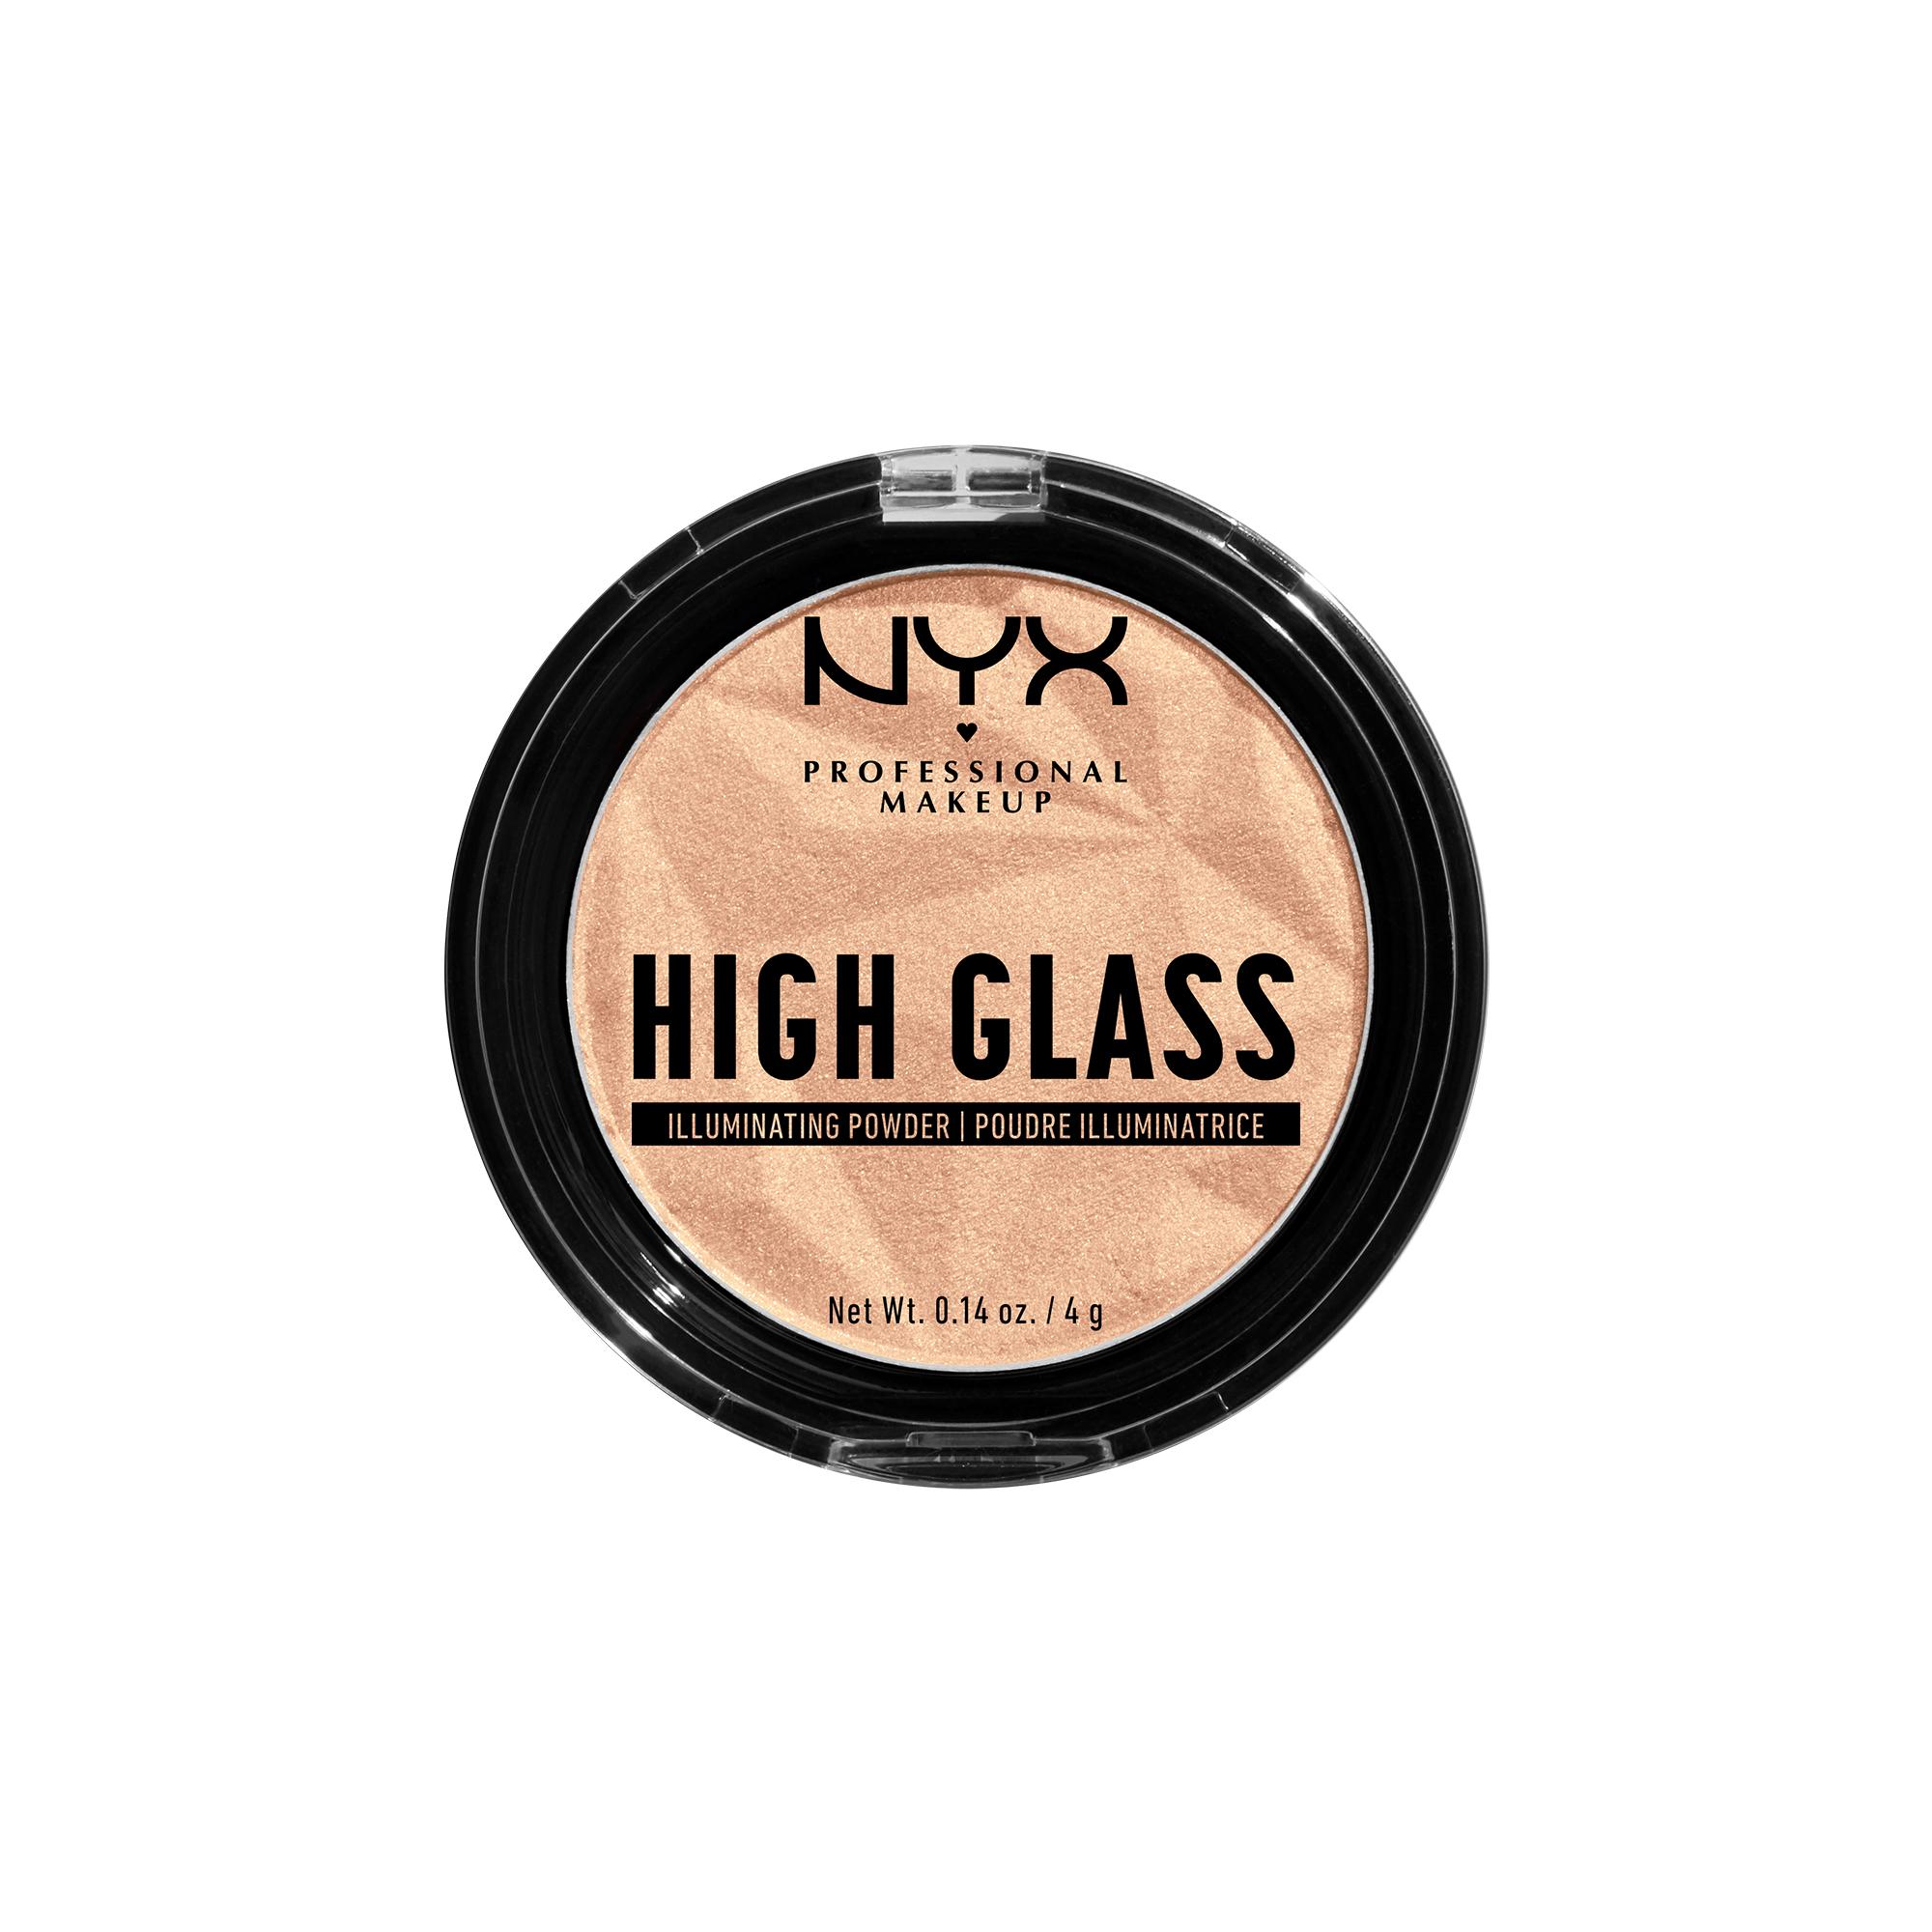 High Glass Illuminating Powder Nyx